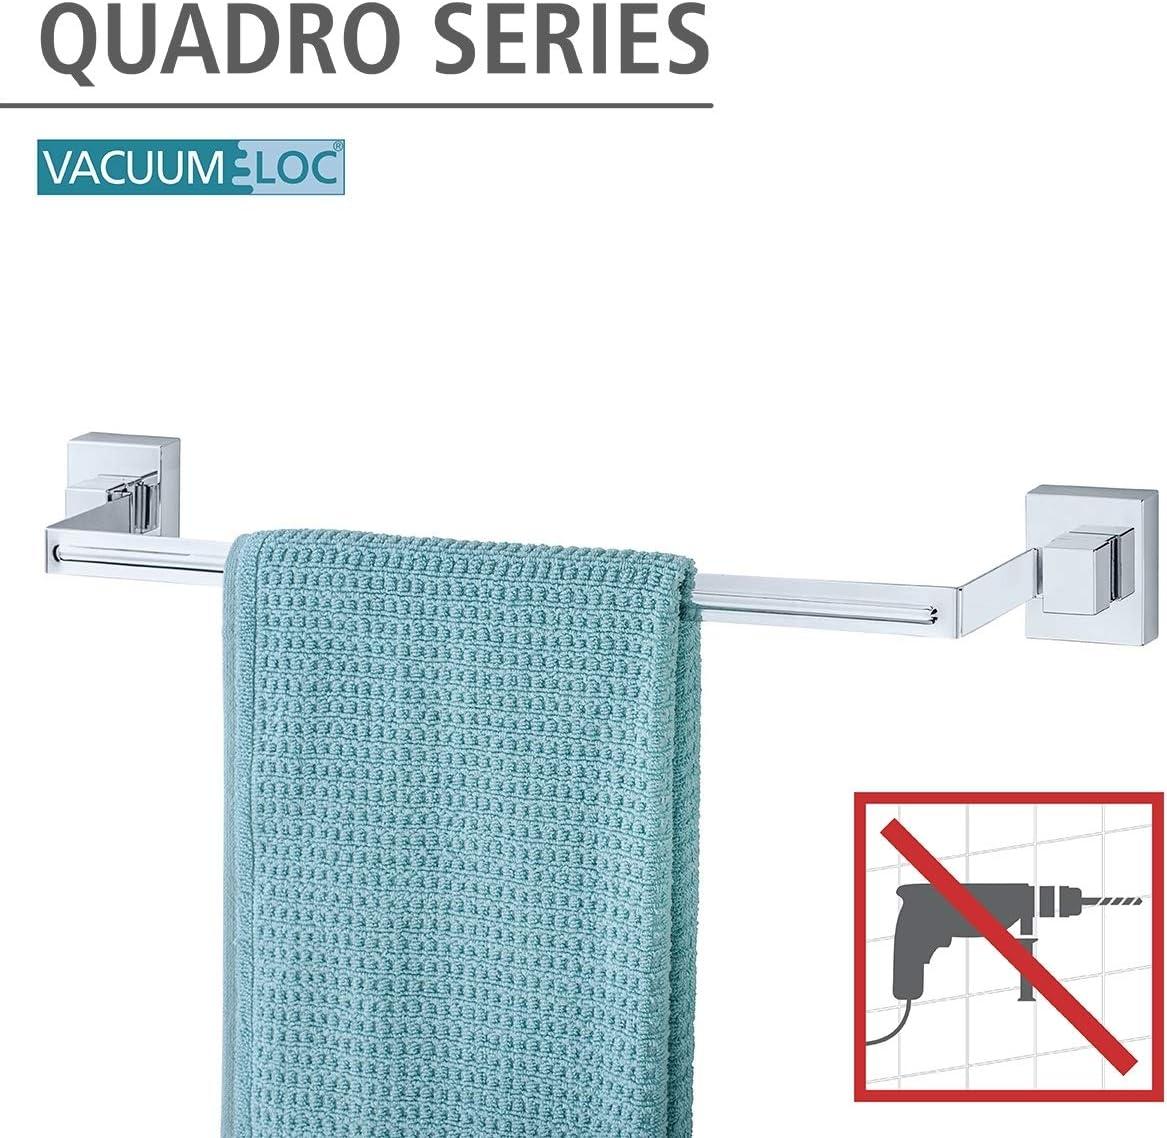 WENKO 22684100 Porte serviette Uno Quadro Vacuum-Loc 60,5 x 6 x 7 cm ABS//Acier Inoxydable